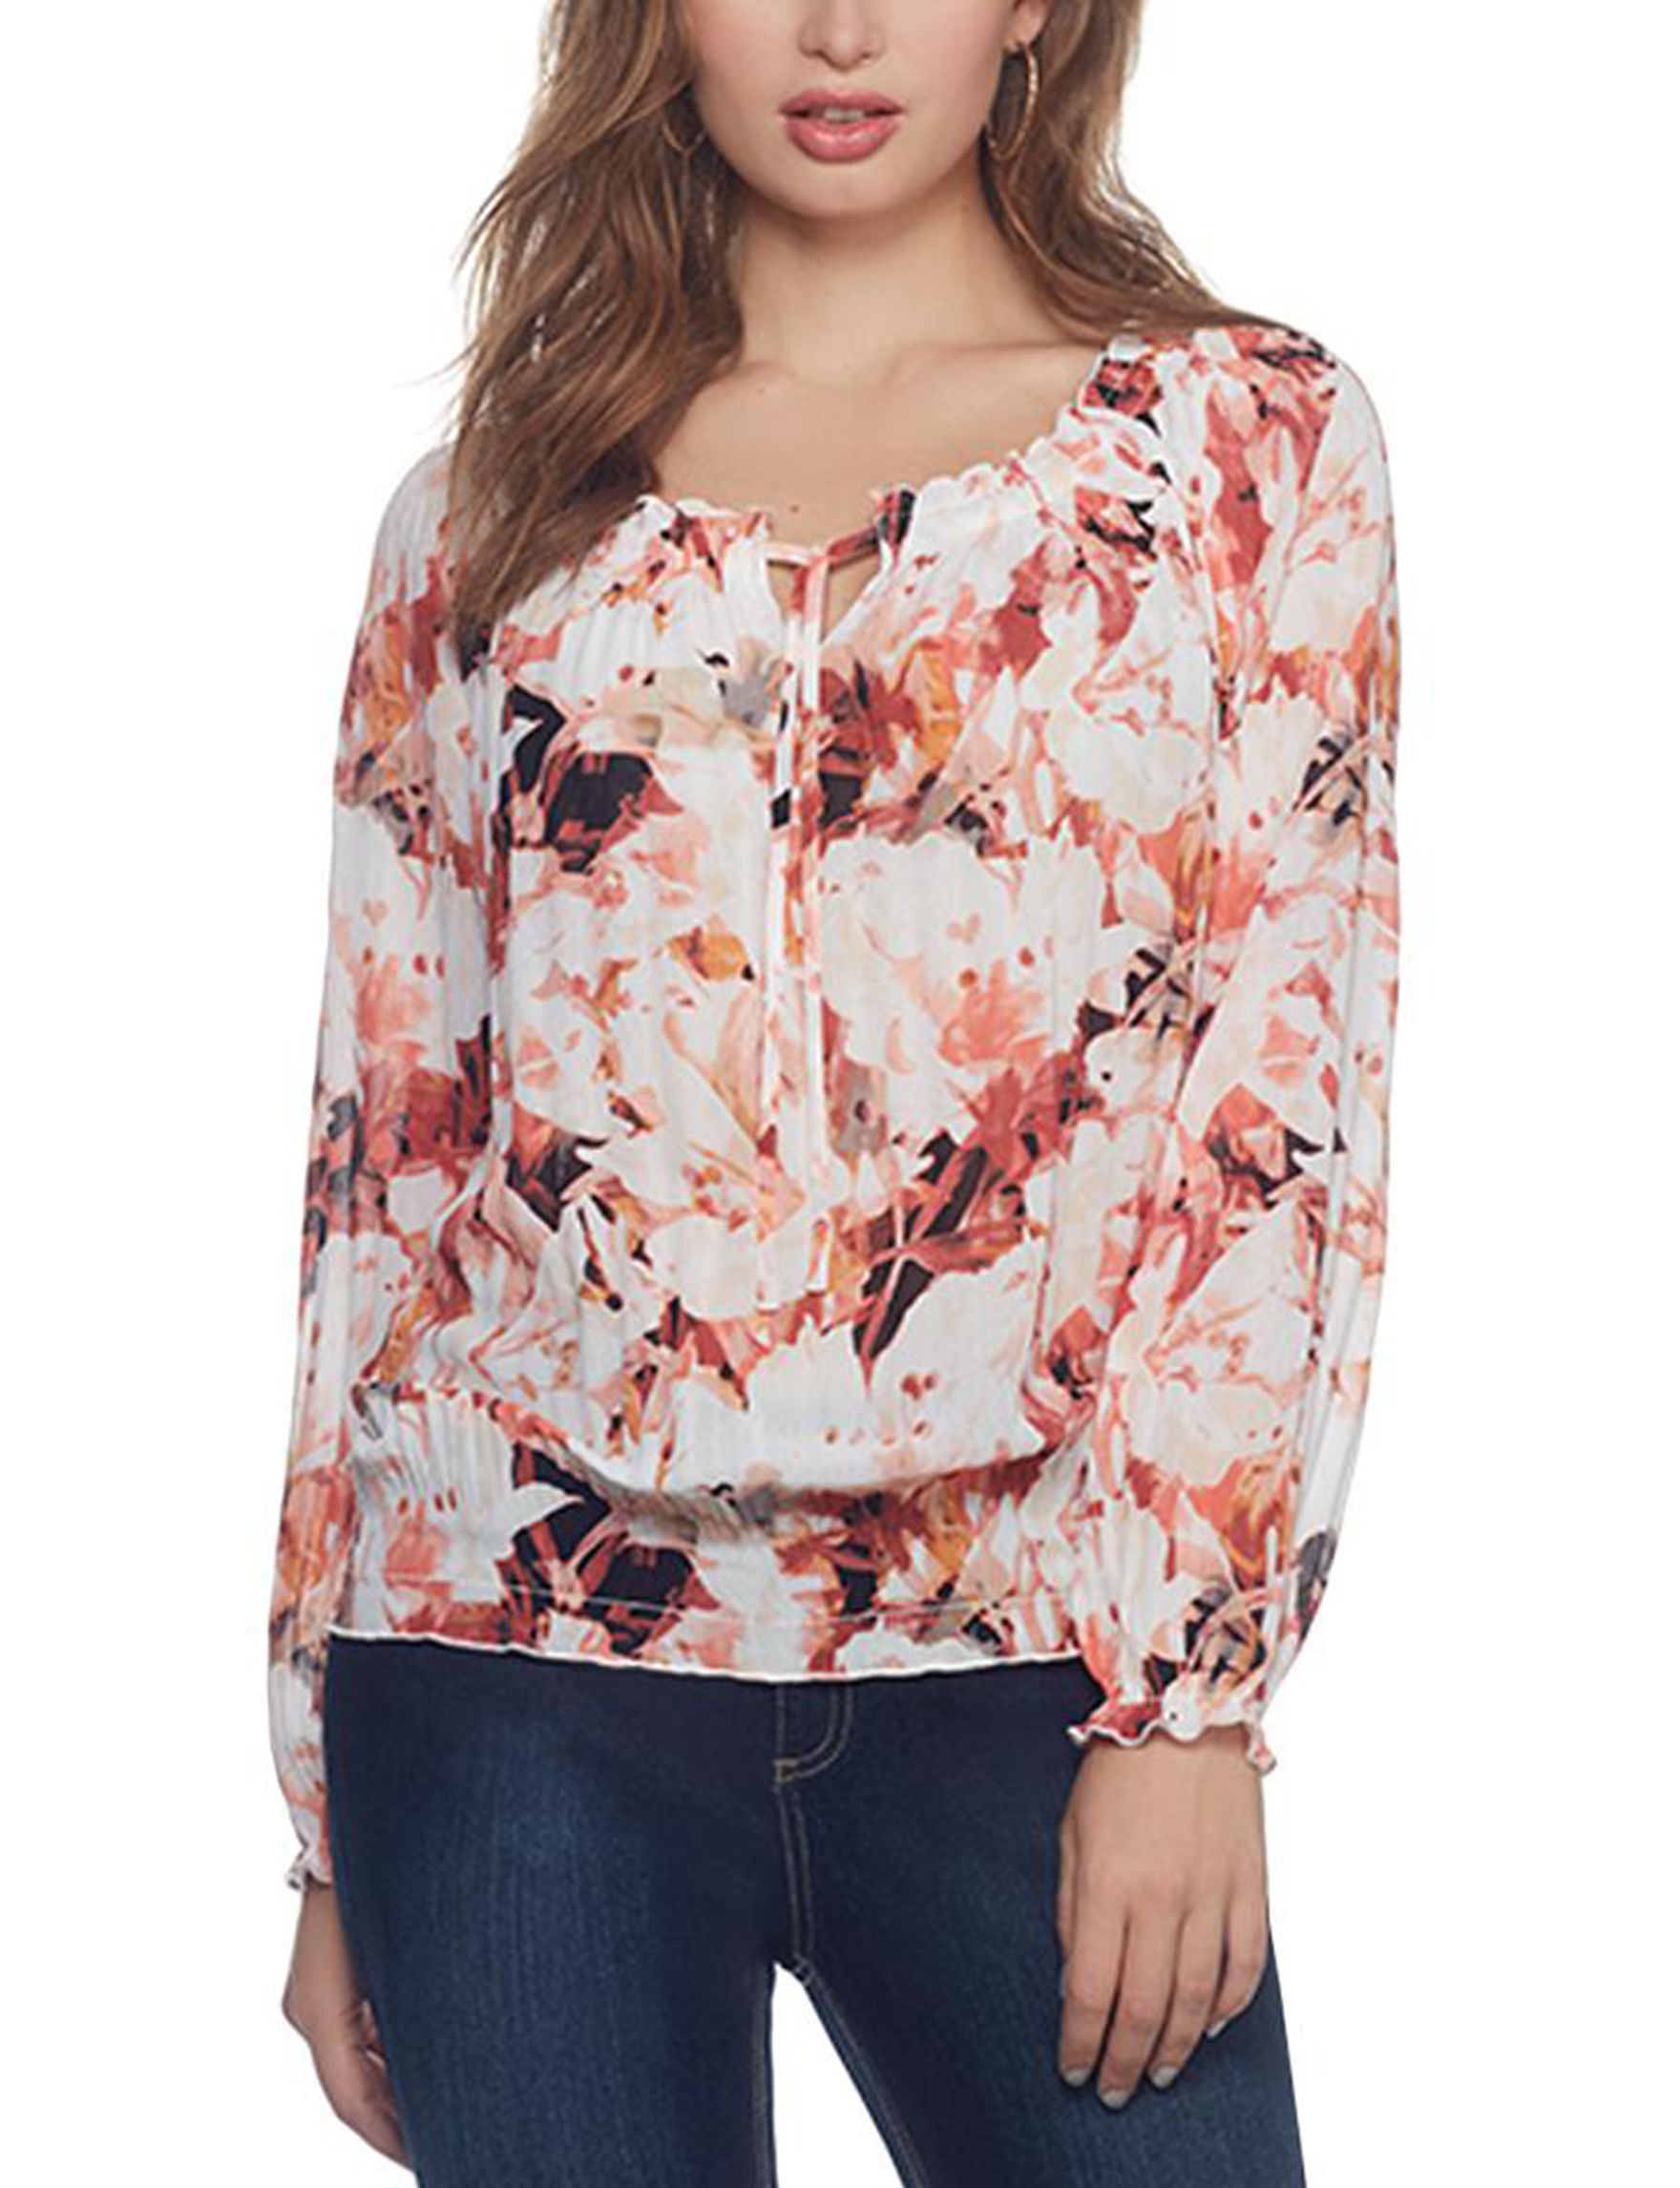 Skyes The Limit Orange Multi Shirts & Blouses